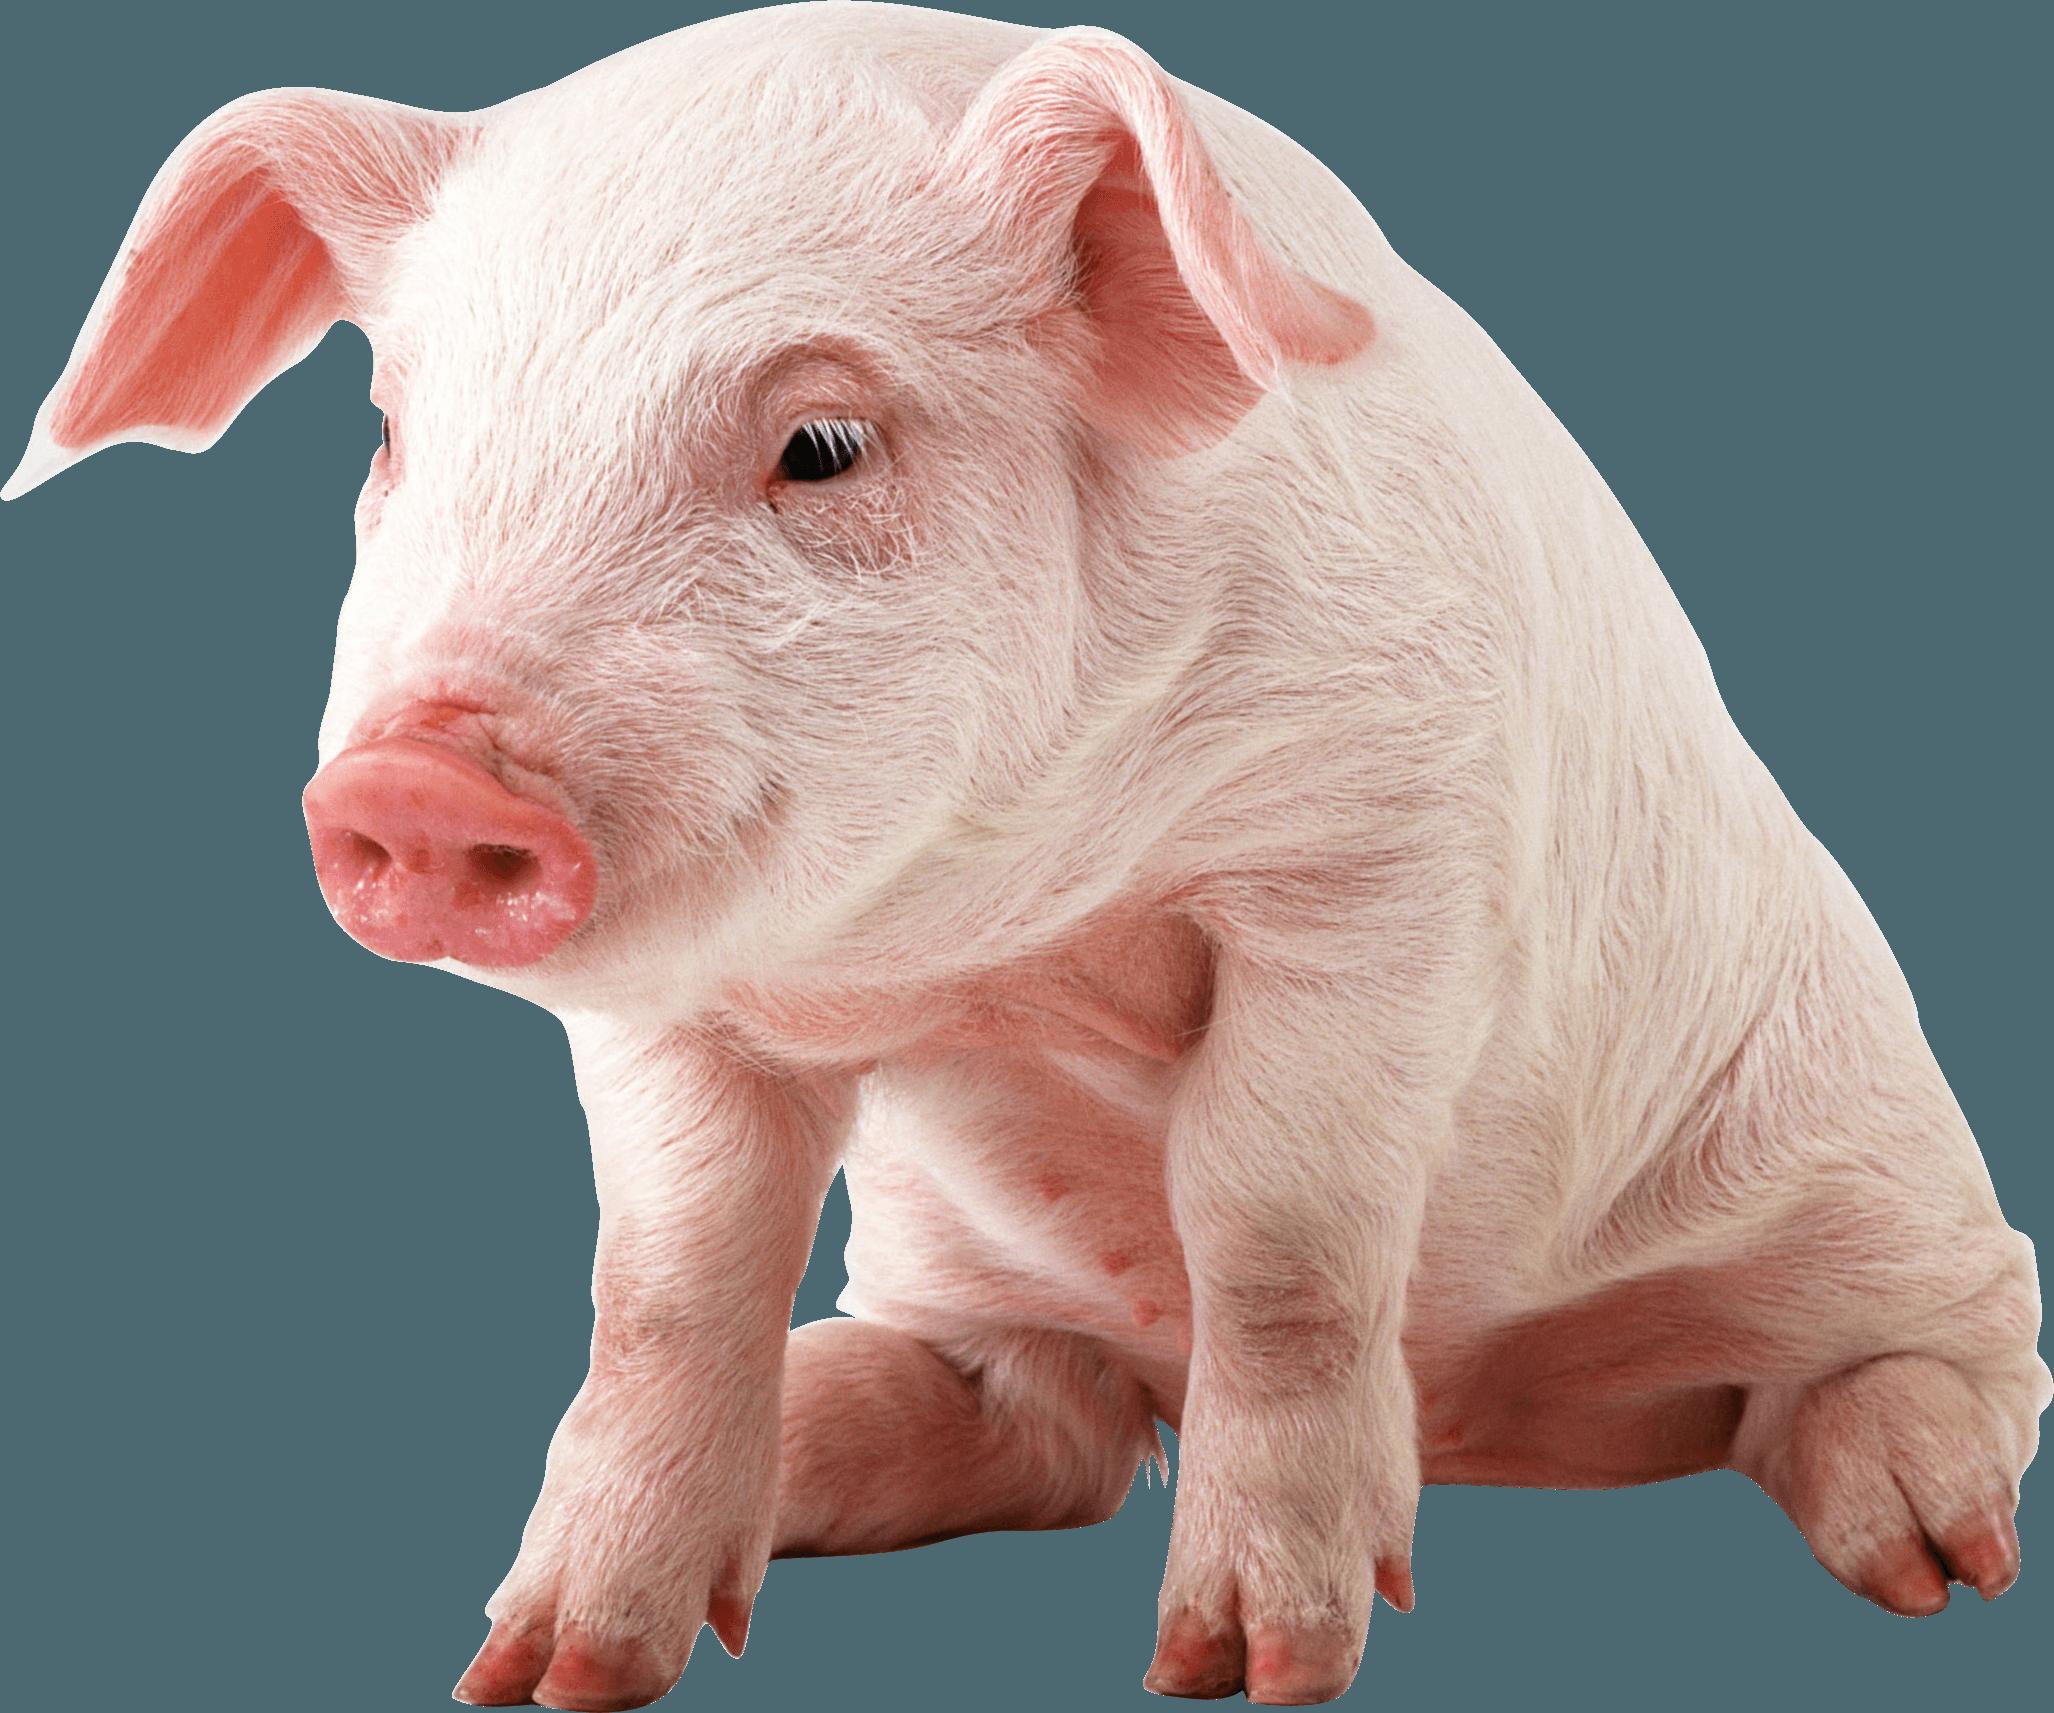 Sitting Baby Pig Png Image Baby Pigs Pet Pigs Pig Wallpaper